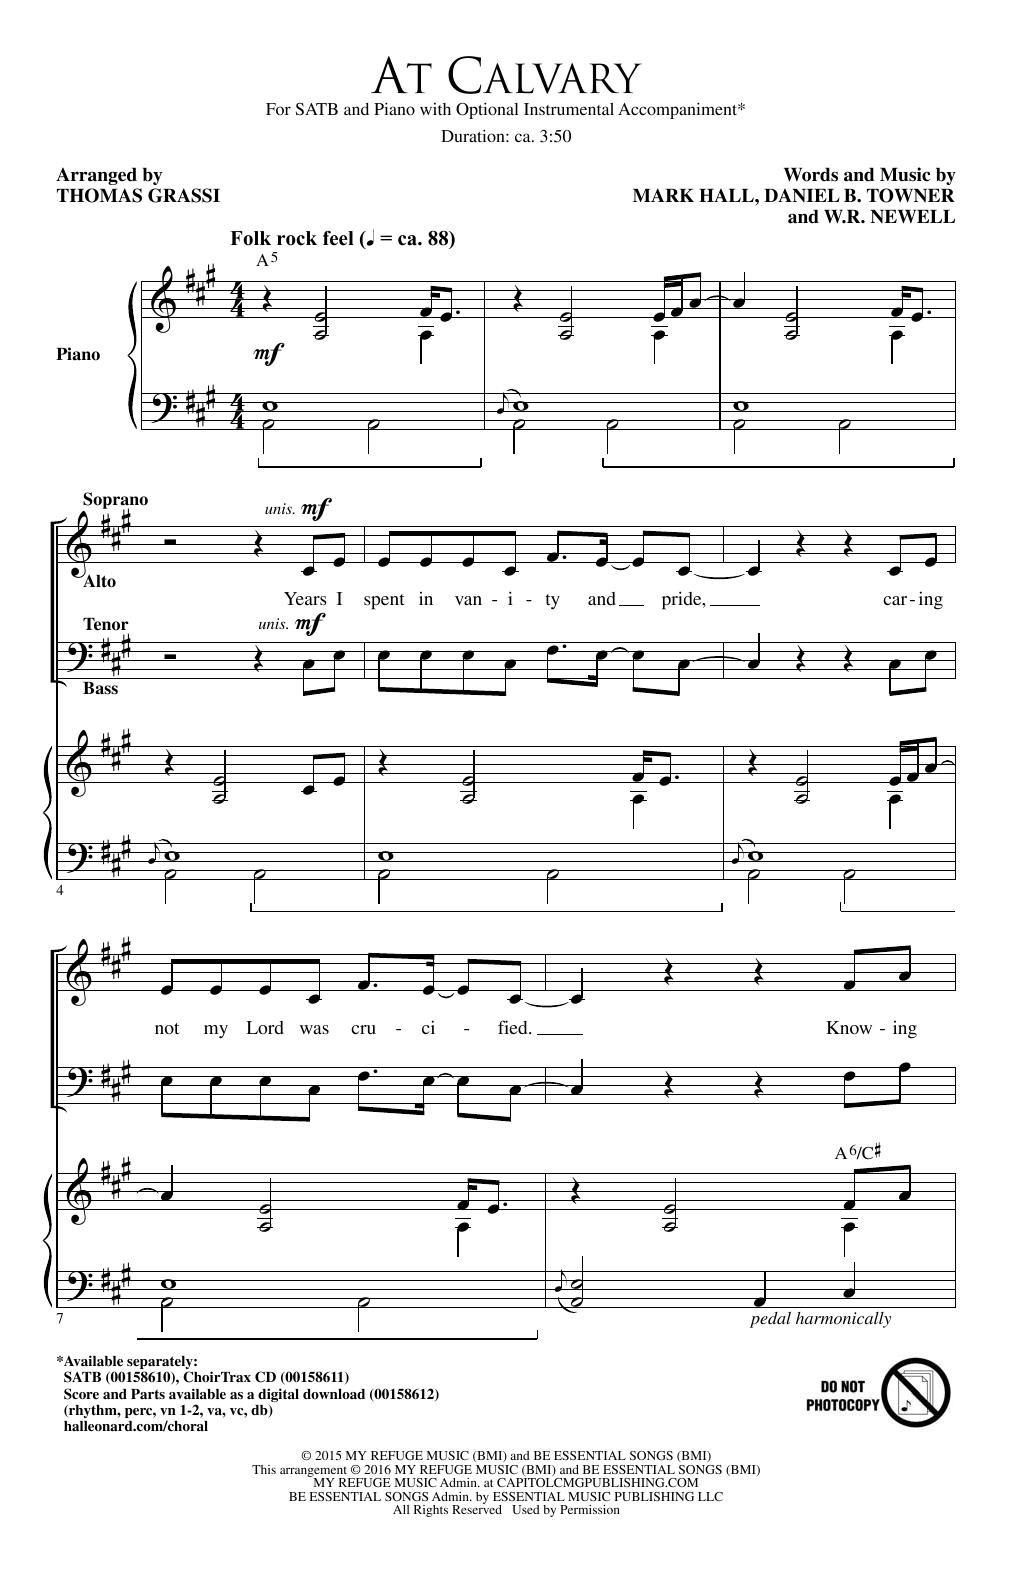 At Calvary (SATB Choir)